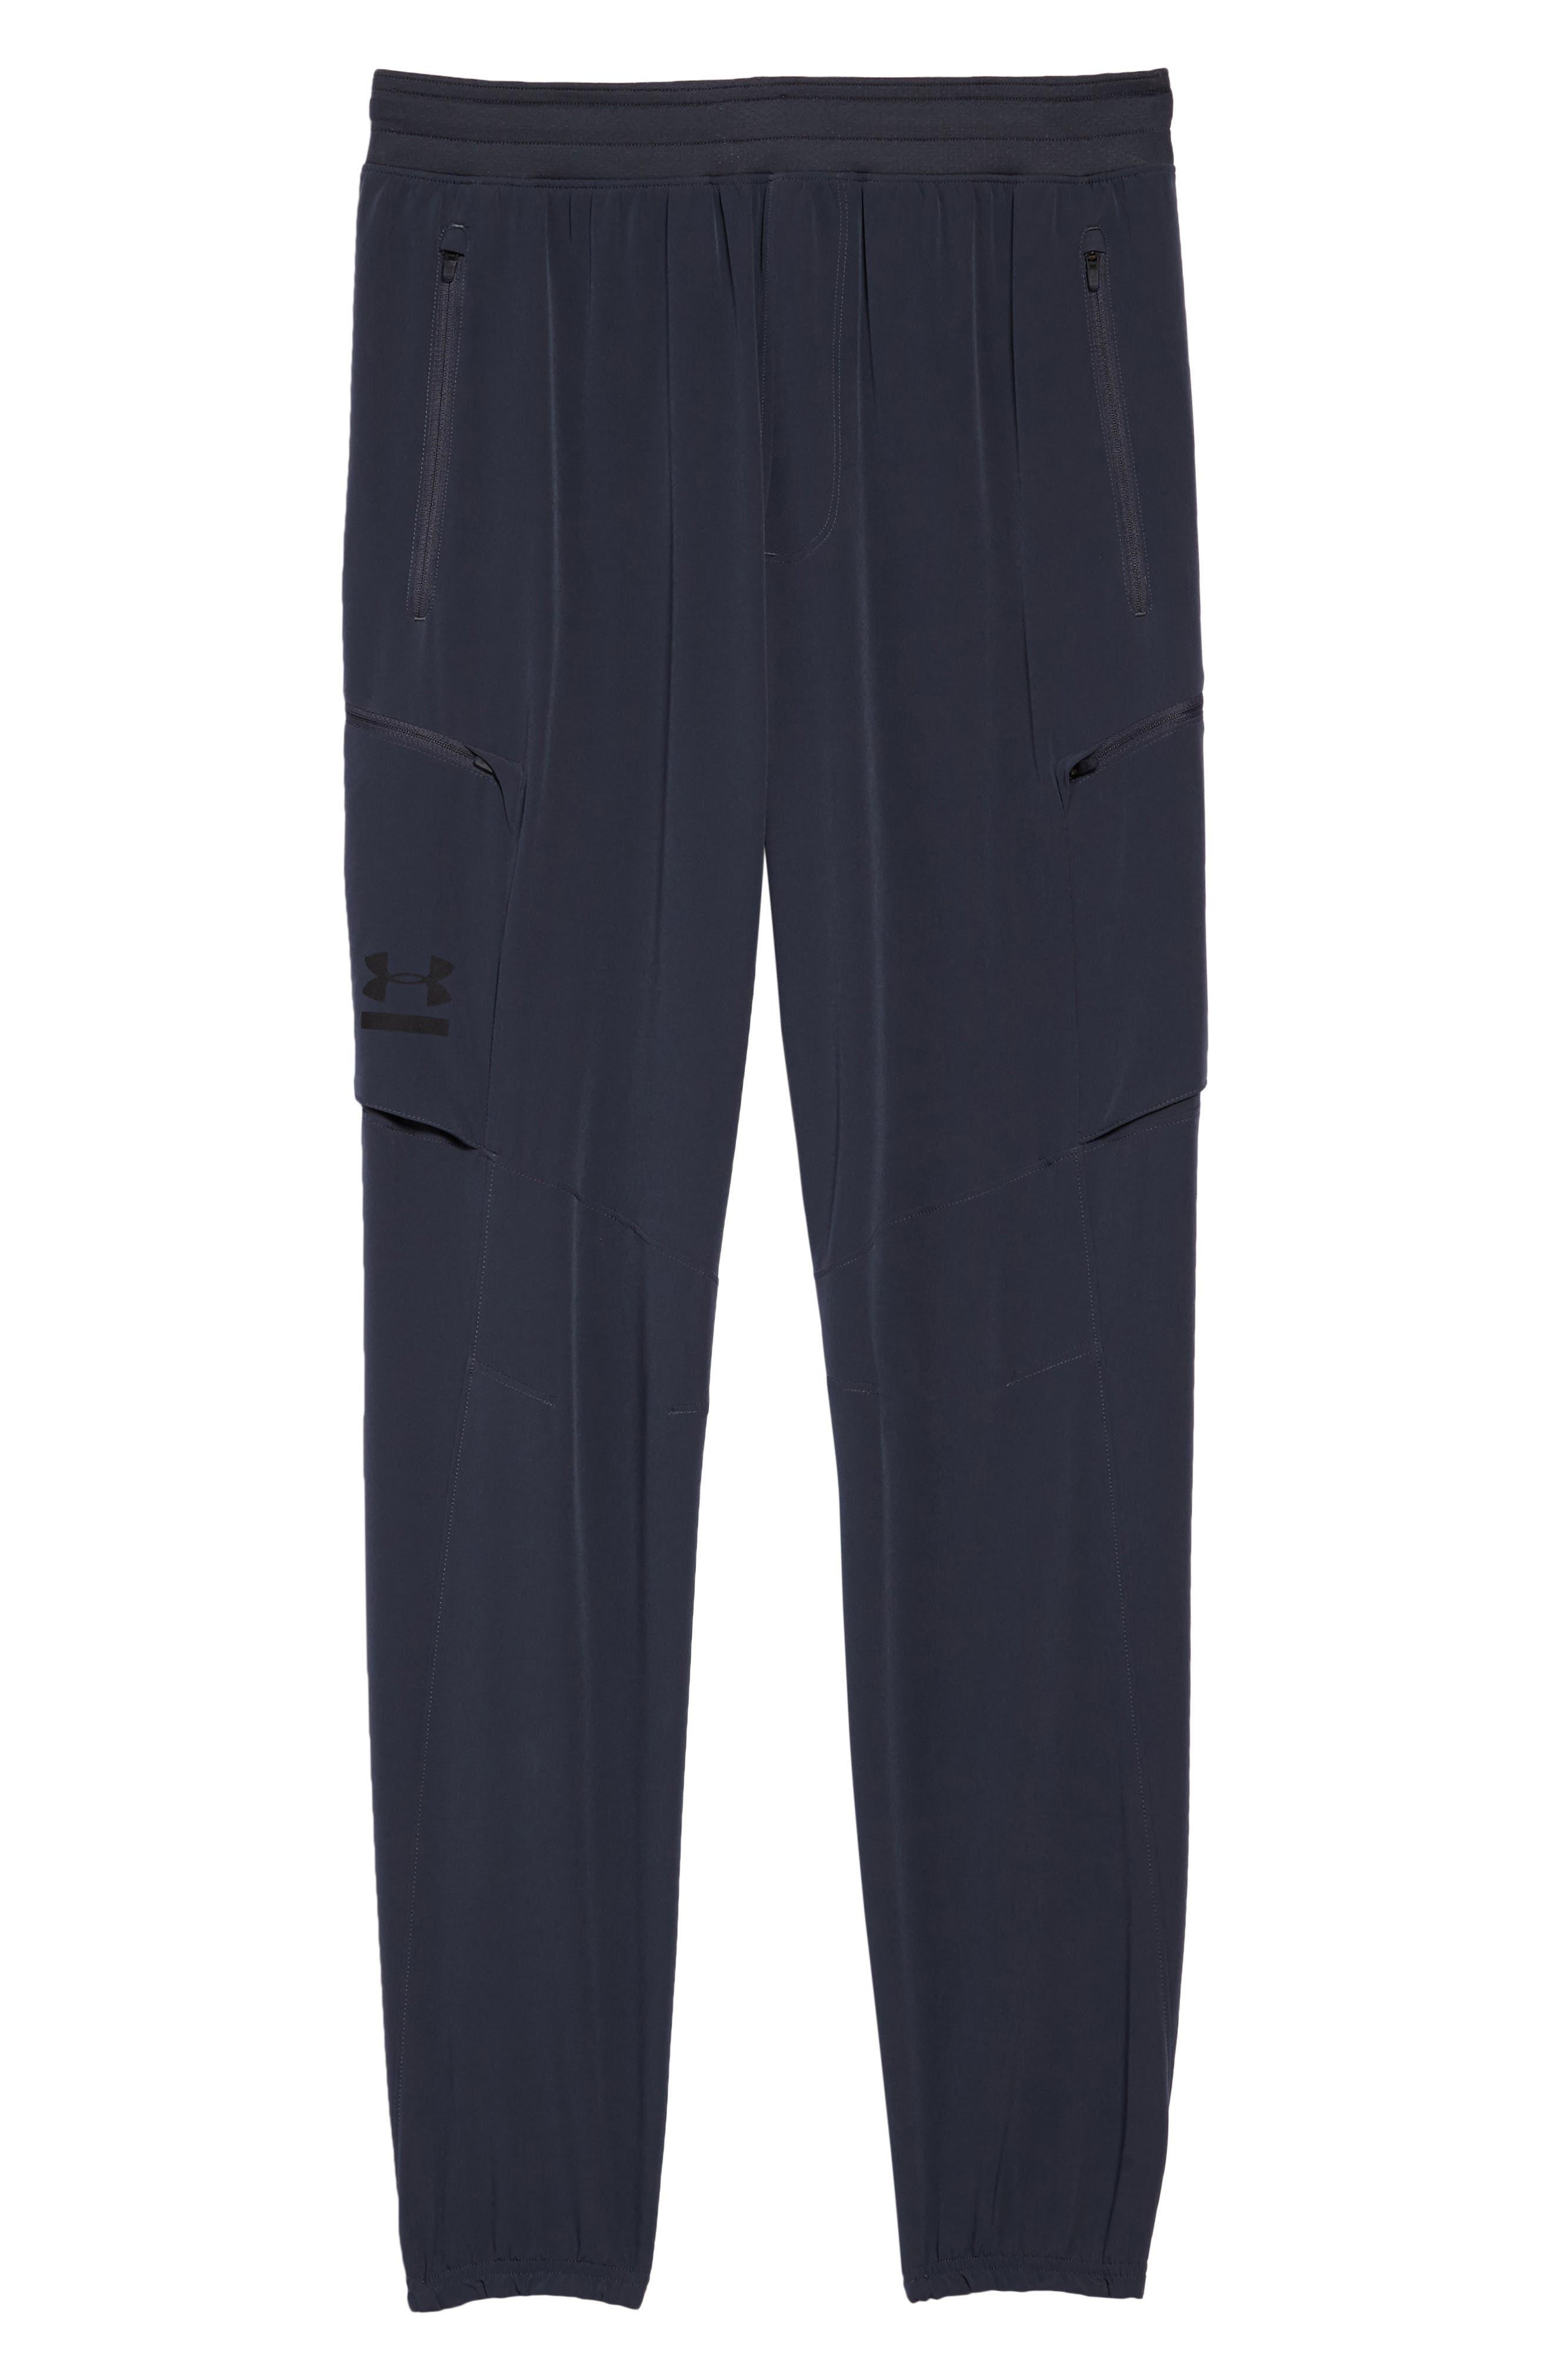 Perpetual Cargo Jogger Pants,                             Alternate thumbnail 6, color,                             Stealth Gray/ Black